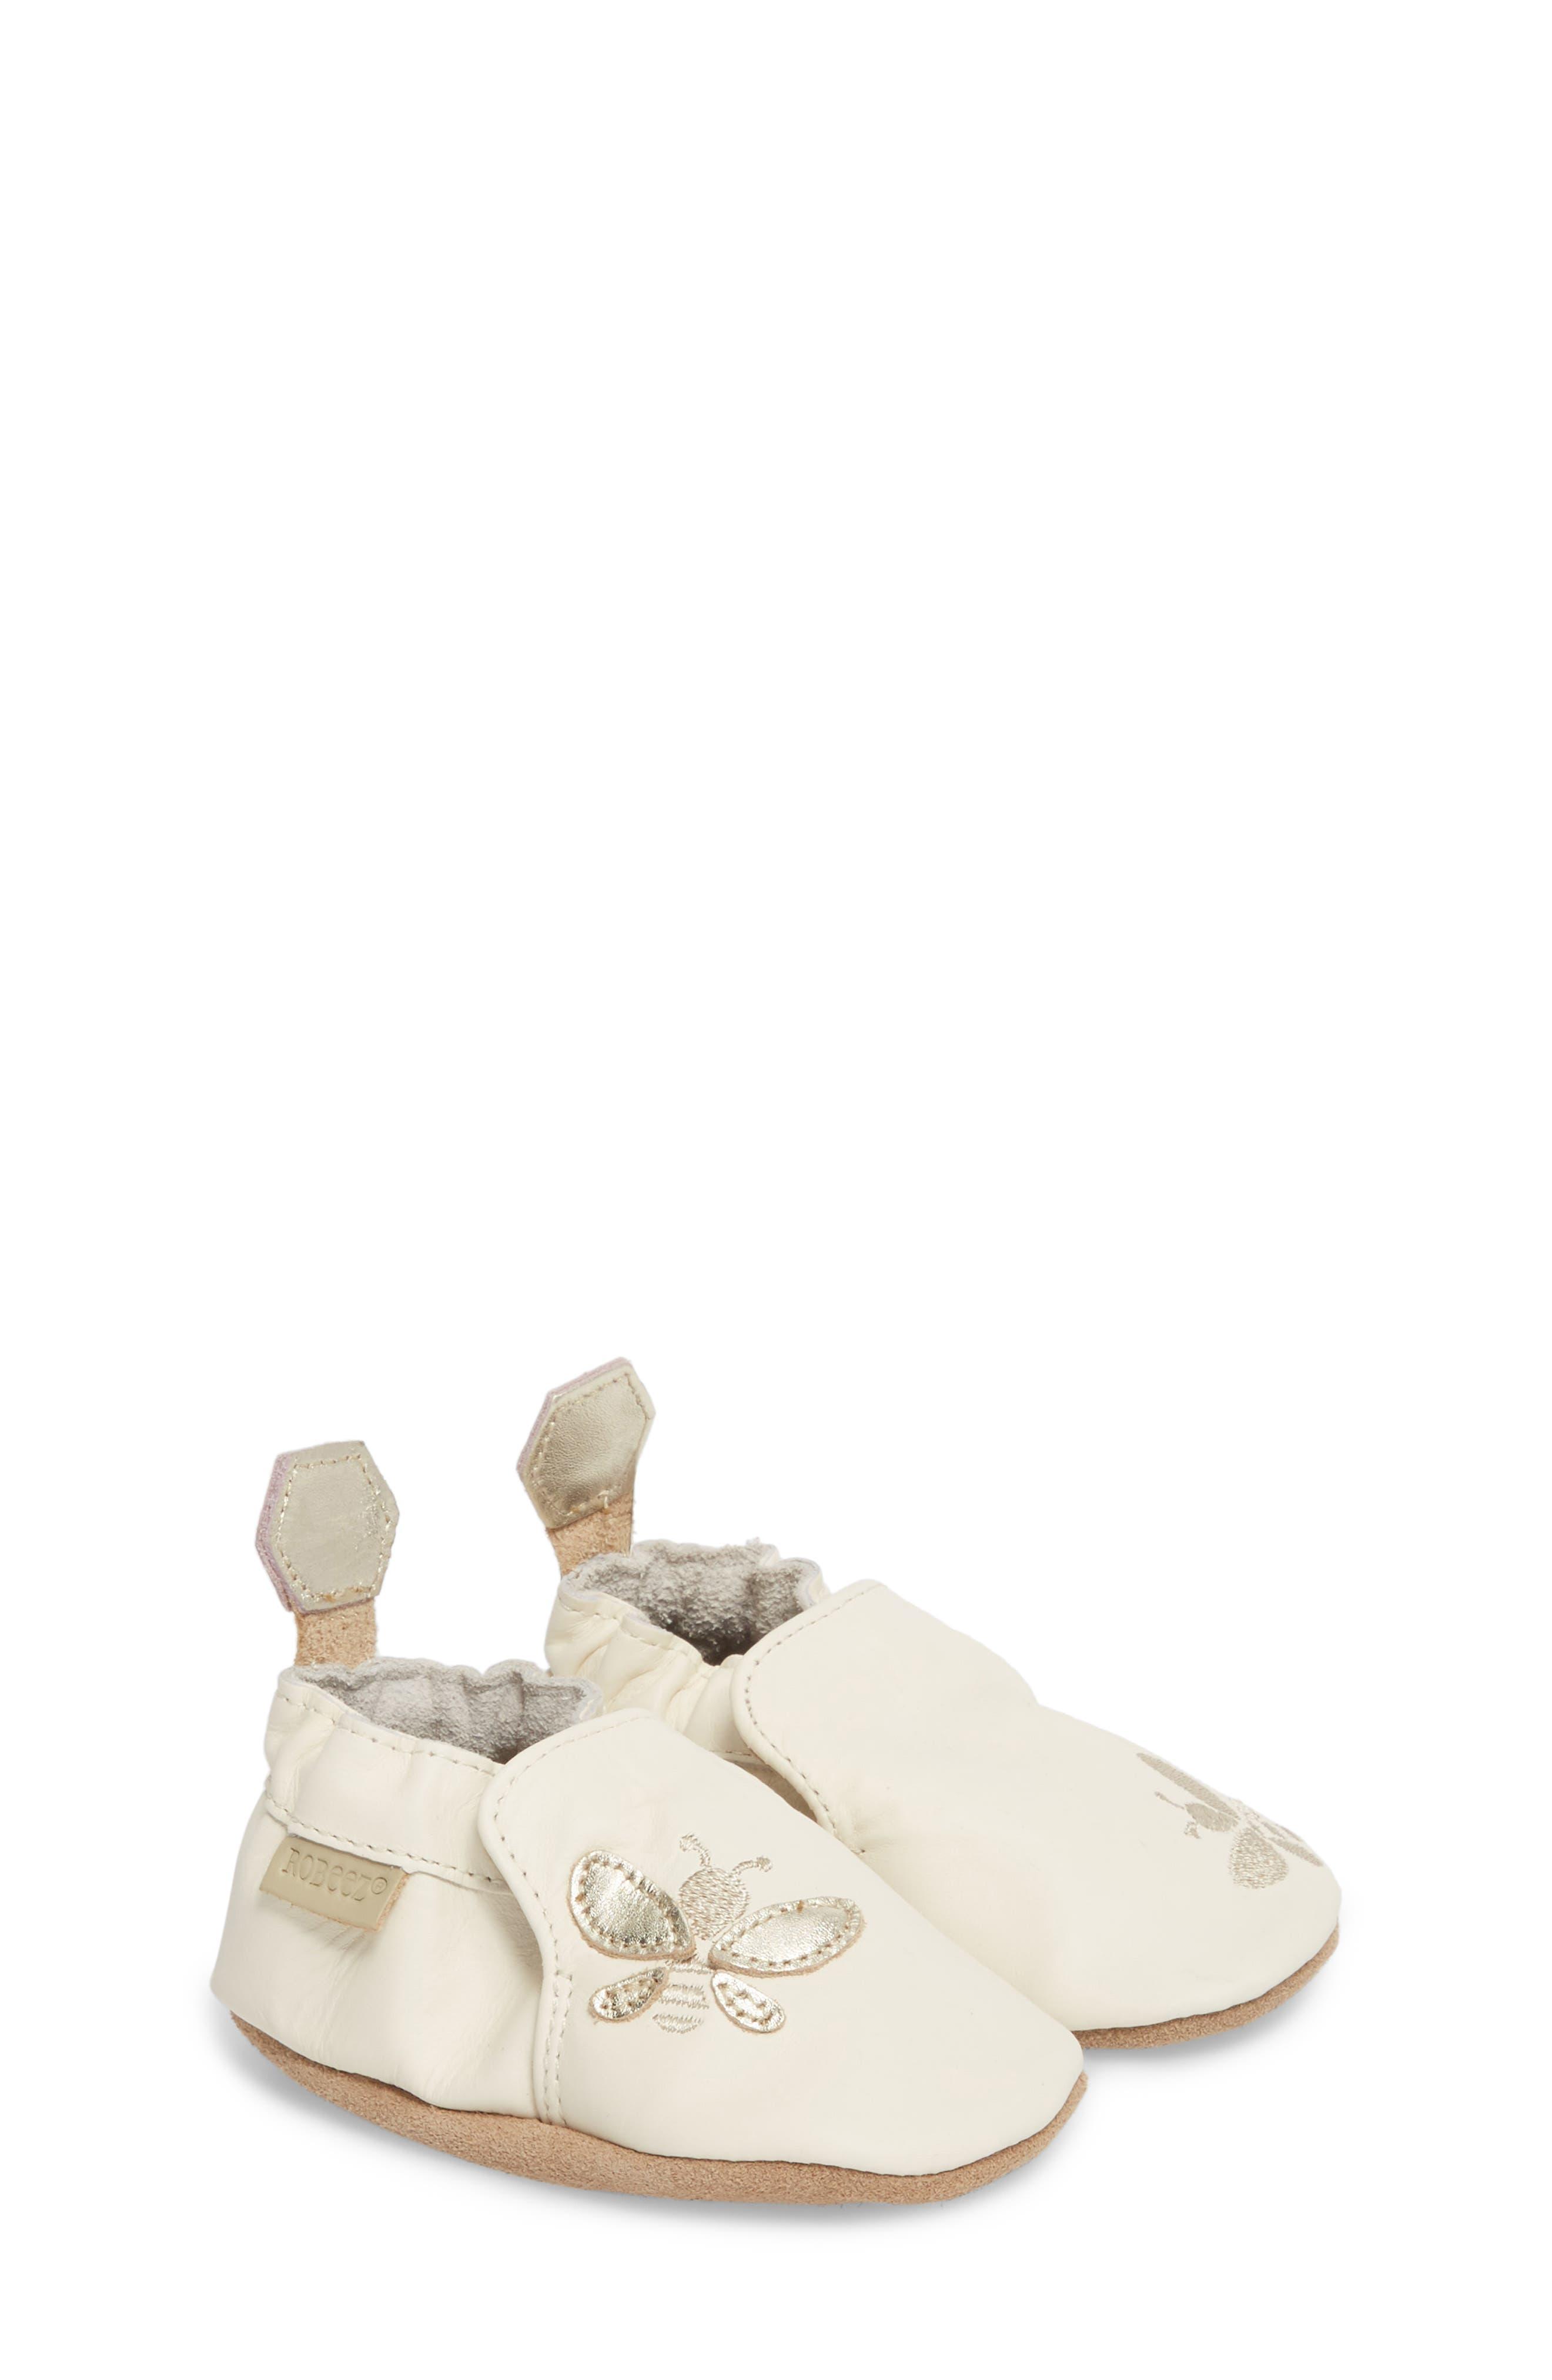 Bee Moccasin Sneaker,                             Alternate thumbnail 3, color,                             Cream